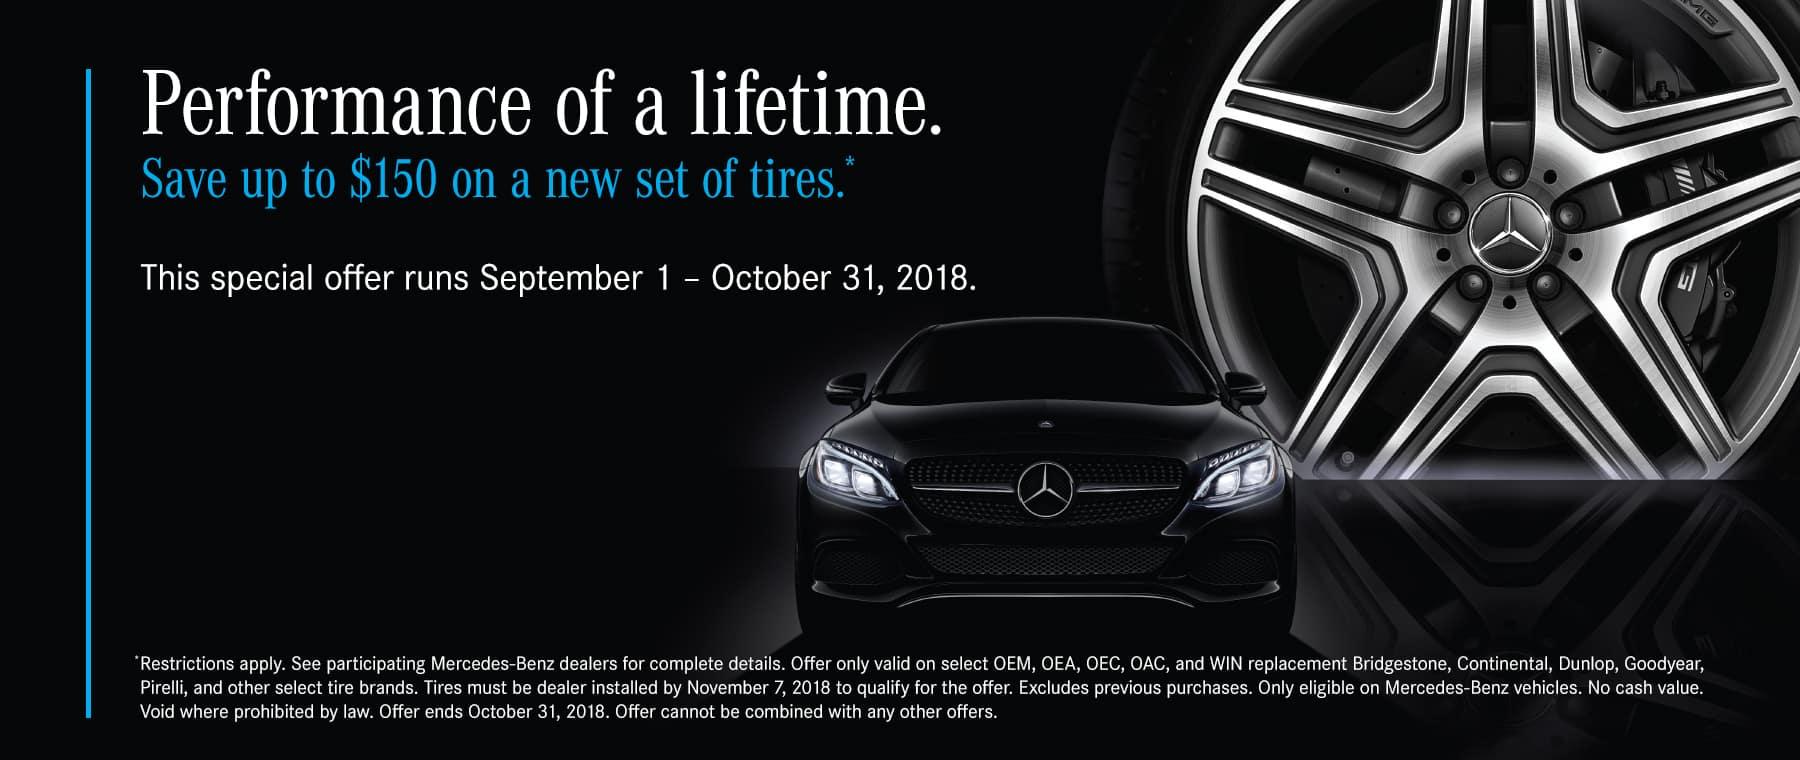 Mercedes Benz Tire Promo Banner